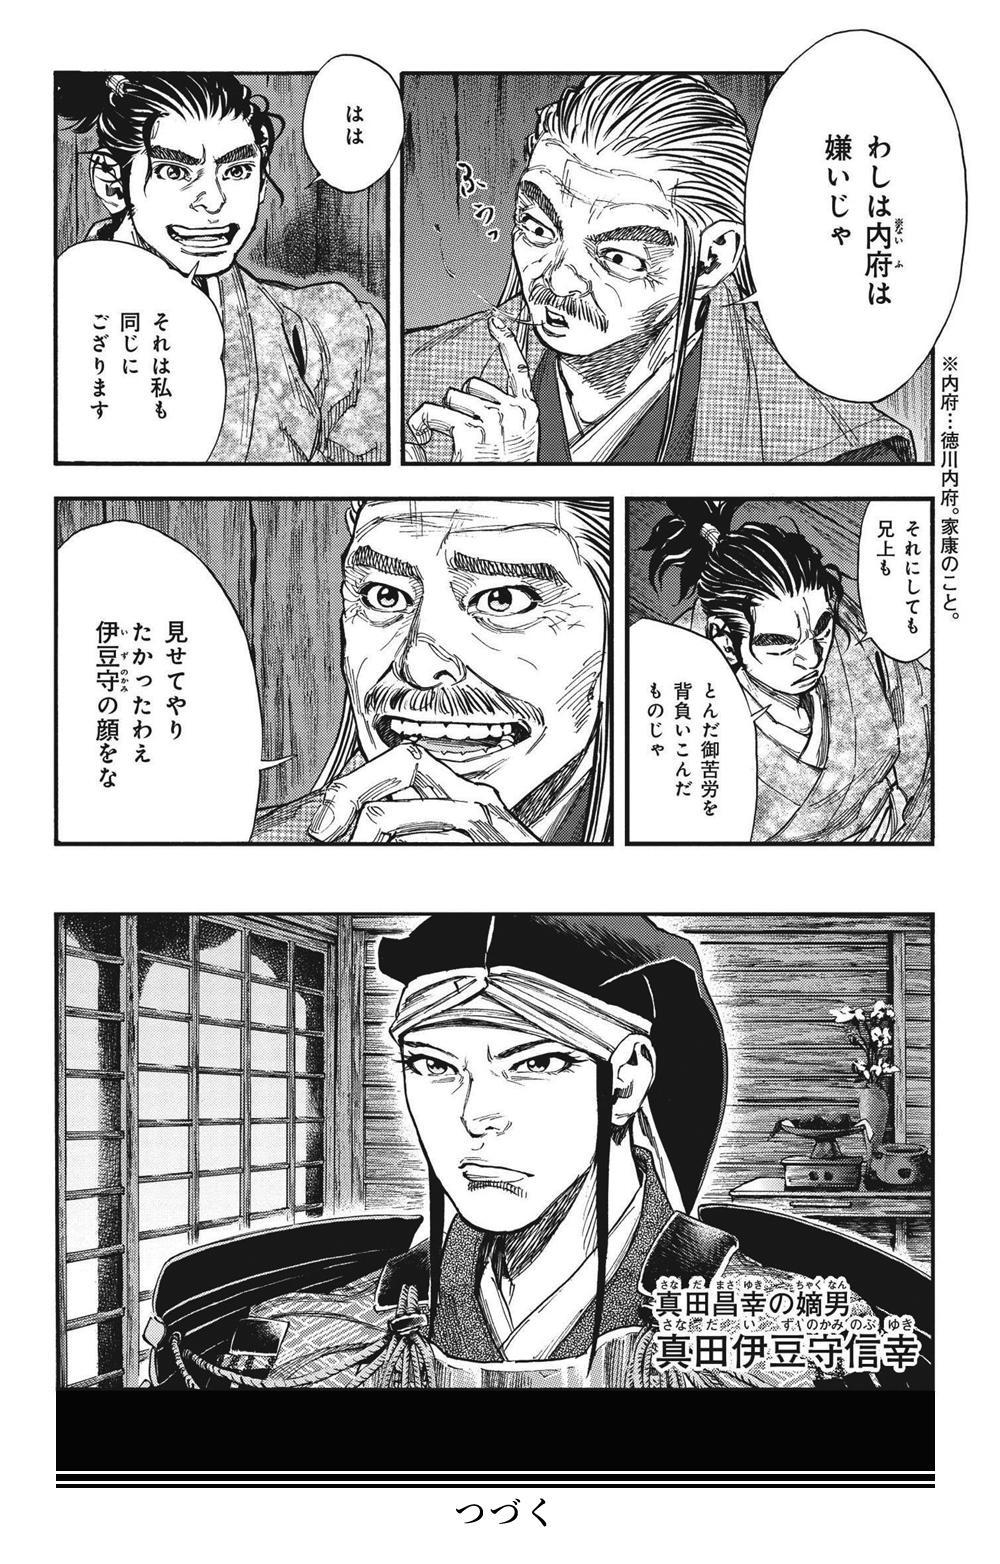 真田太平記 第0話「日本一の兵」①sanada-more.jpg